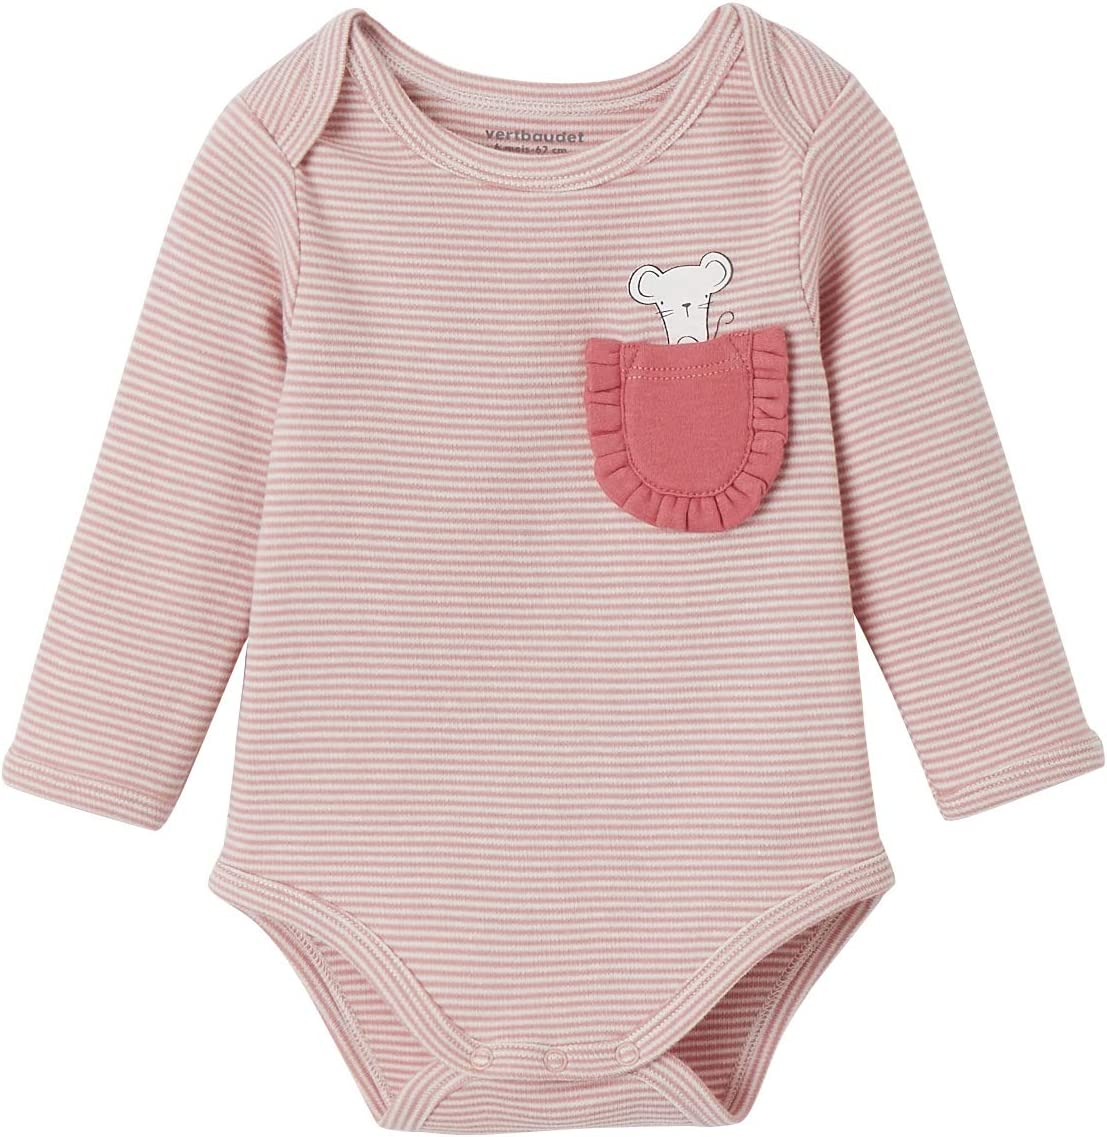 VERTBAUDET Body bebé 100% algodón de manga larga ROSA CLARO A ...